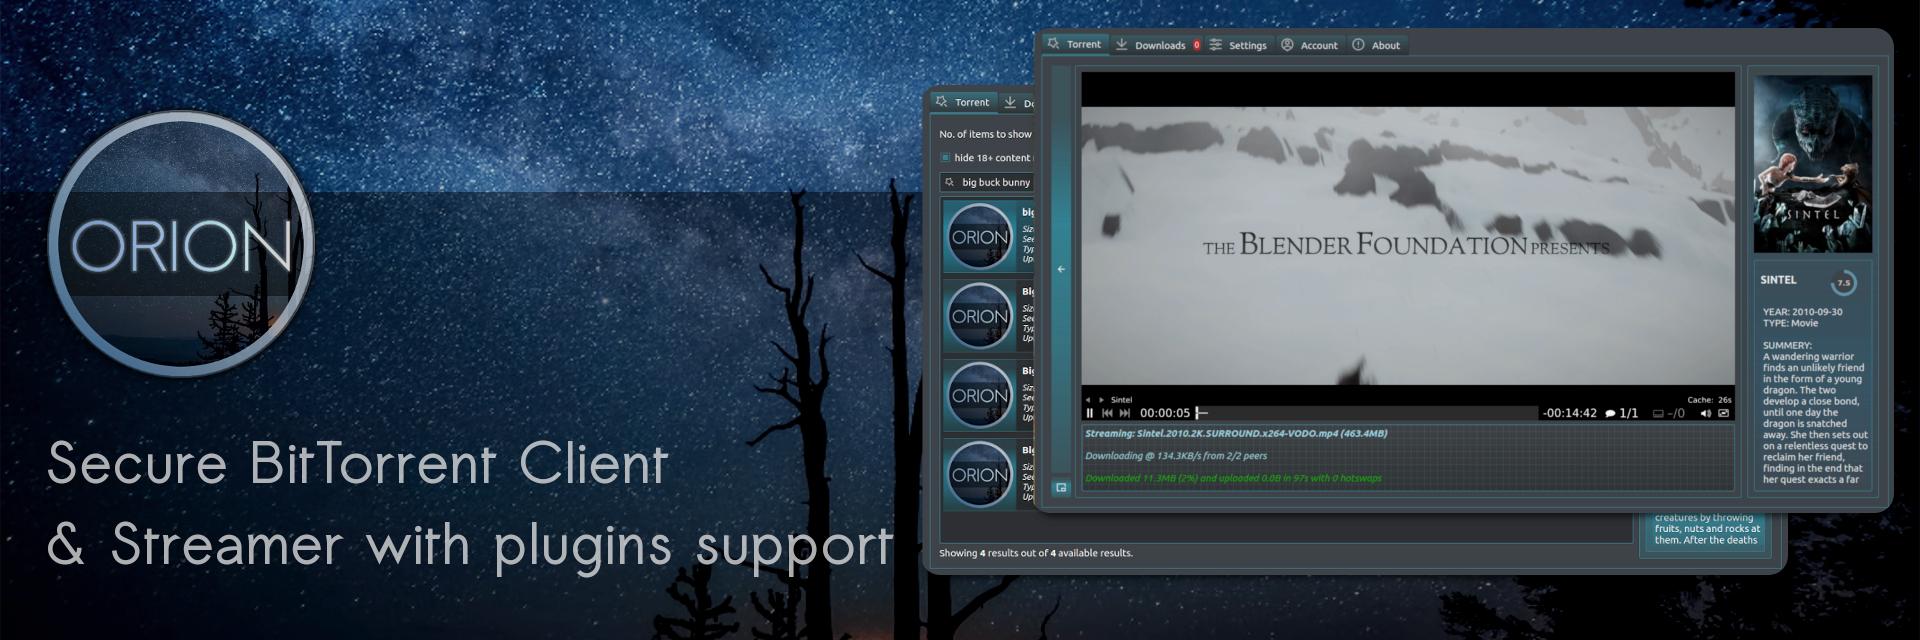 Orion - BitTorrent Client & Streamer banner